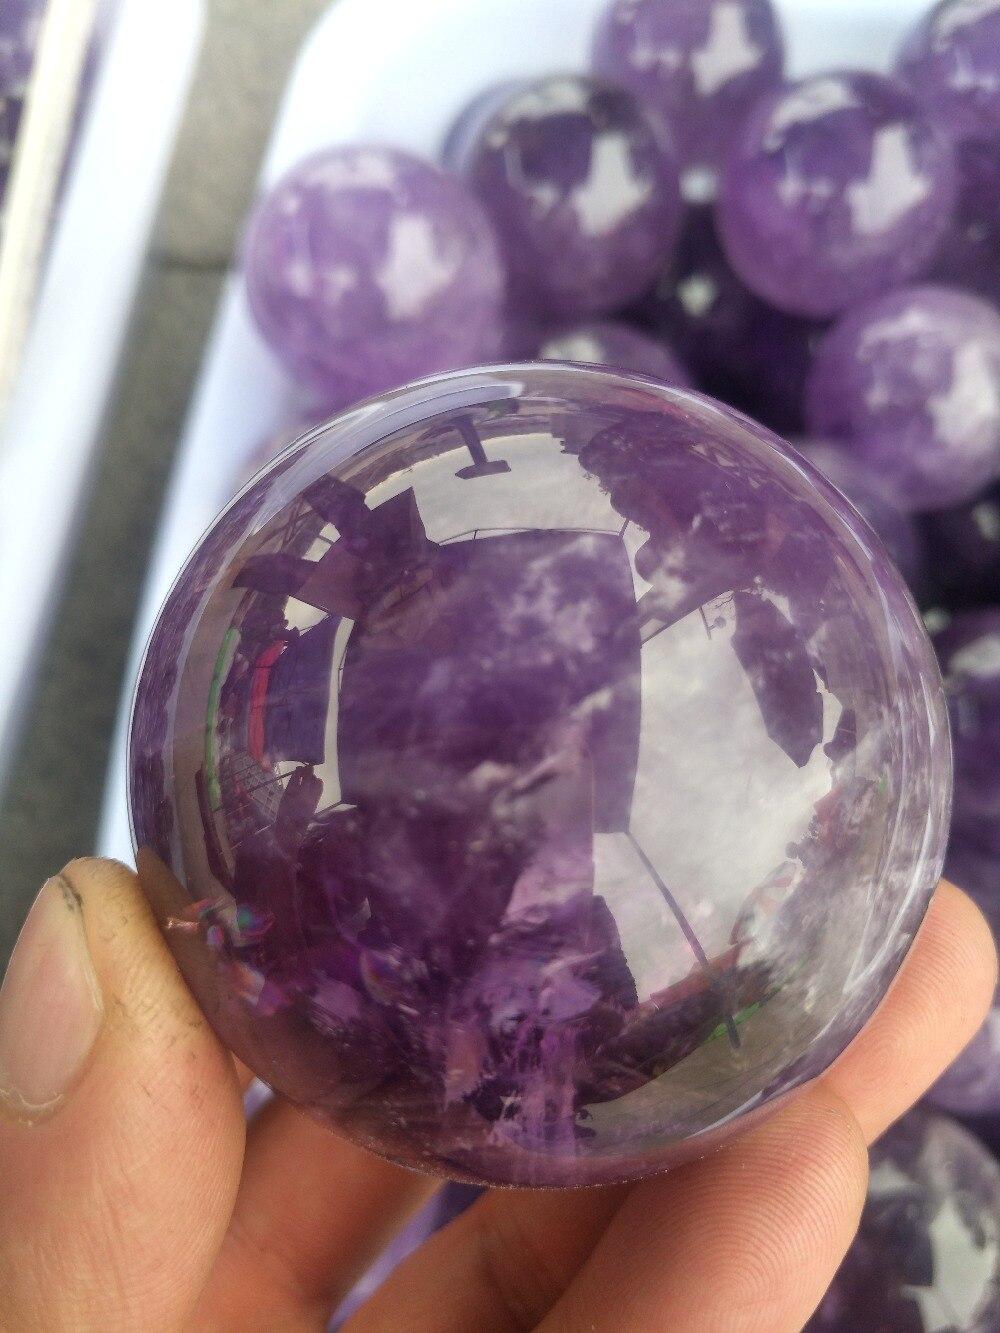 50mm natural amethyst quartz crystal gemstone sphere reiki healing Orb ball Home Decor meditation